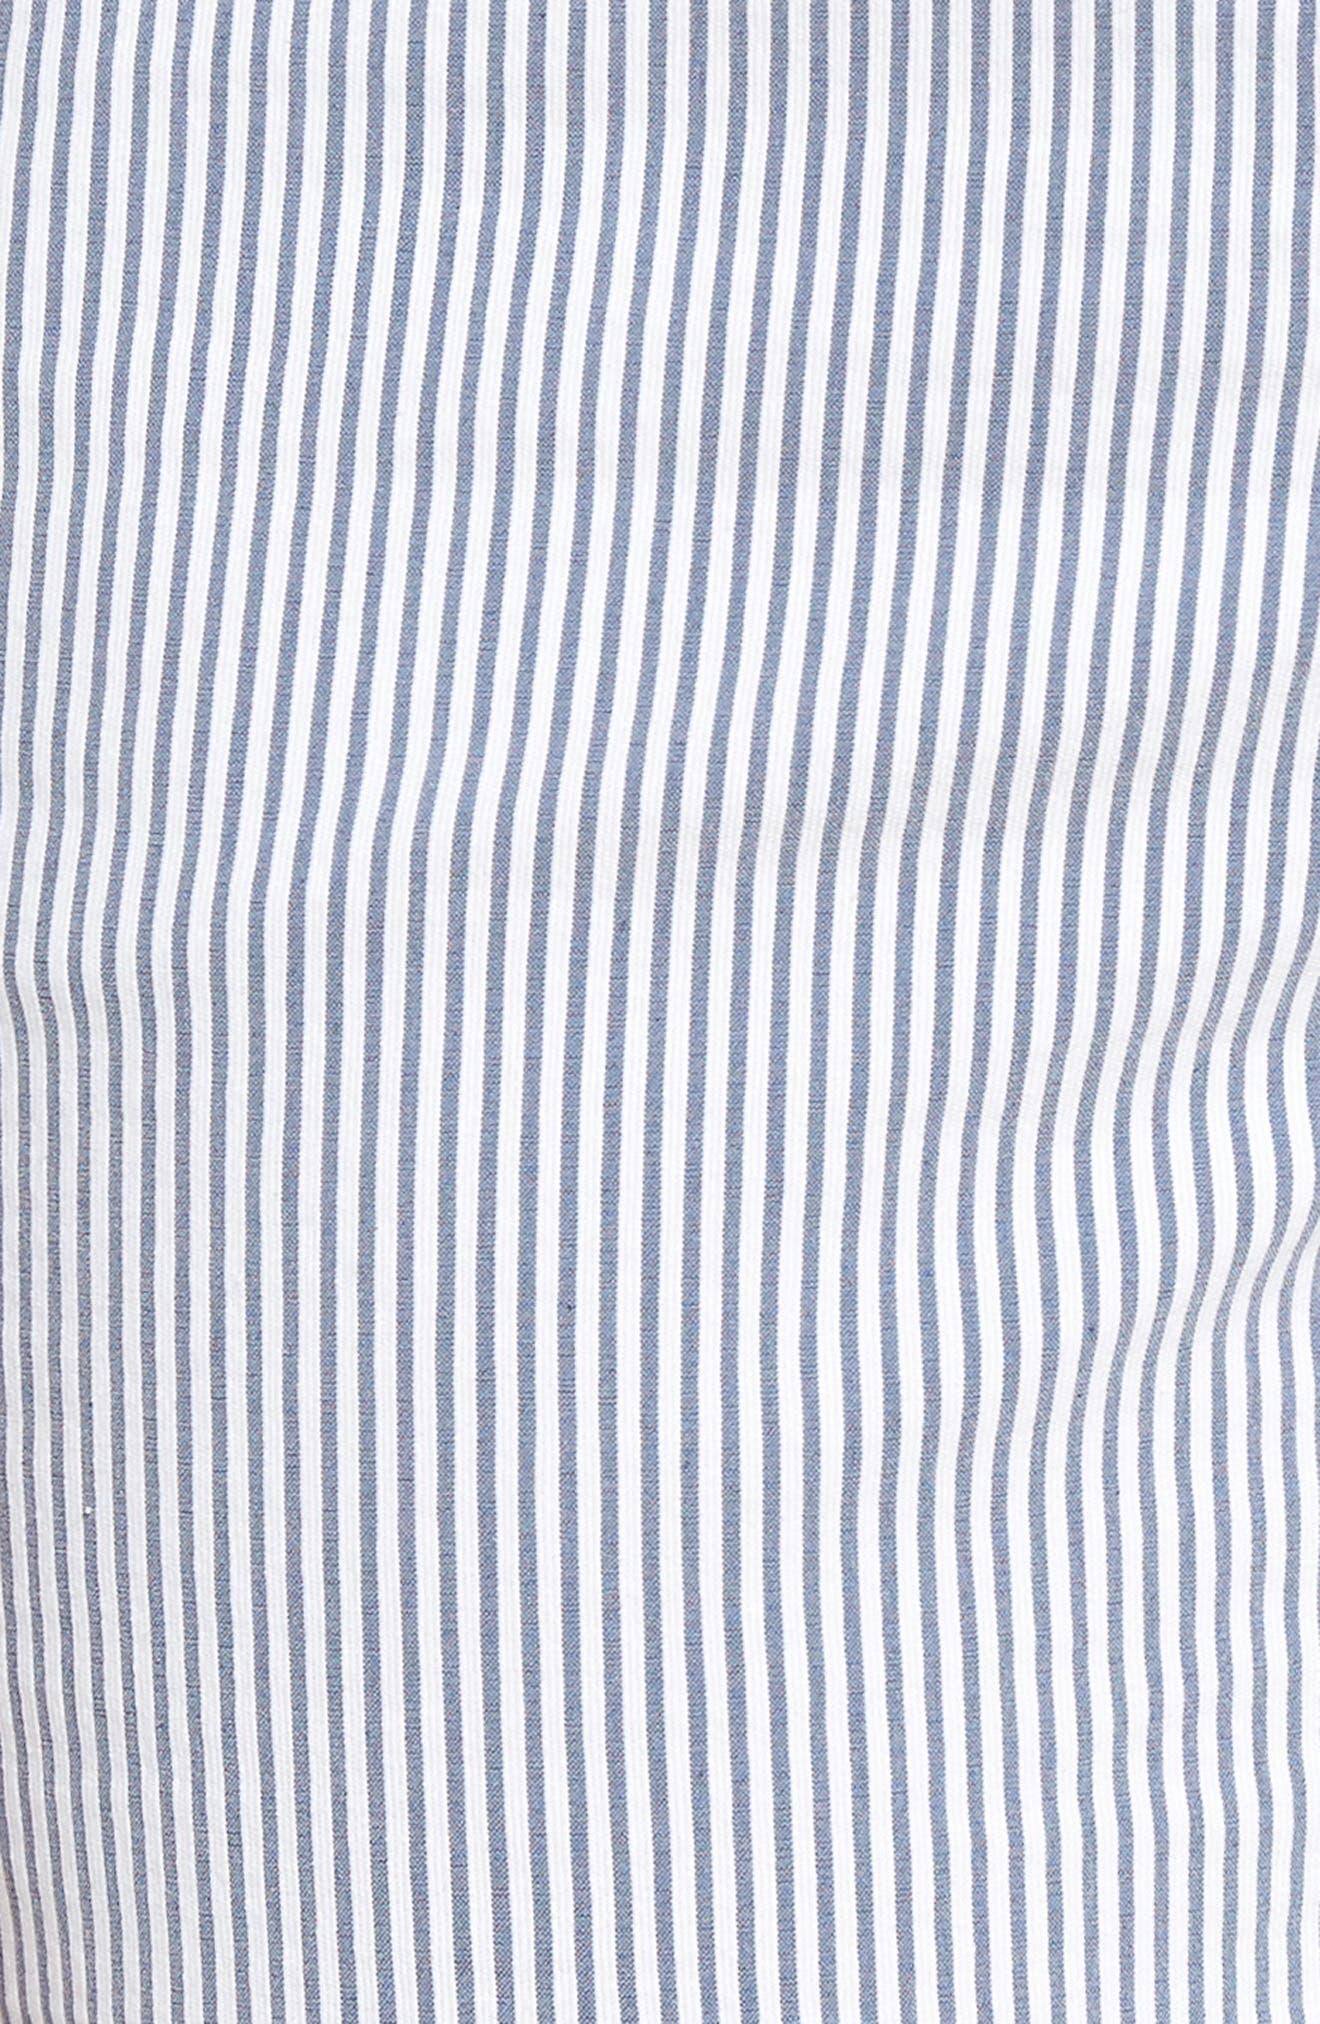 Stretch Bermuda Shorts,                             Alternate thumbnail 5, color,                             Blue- White Seersucker